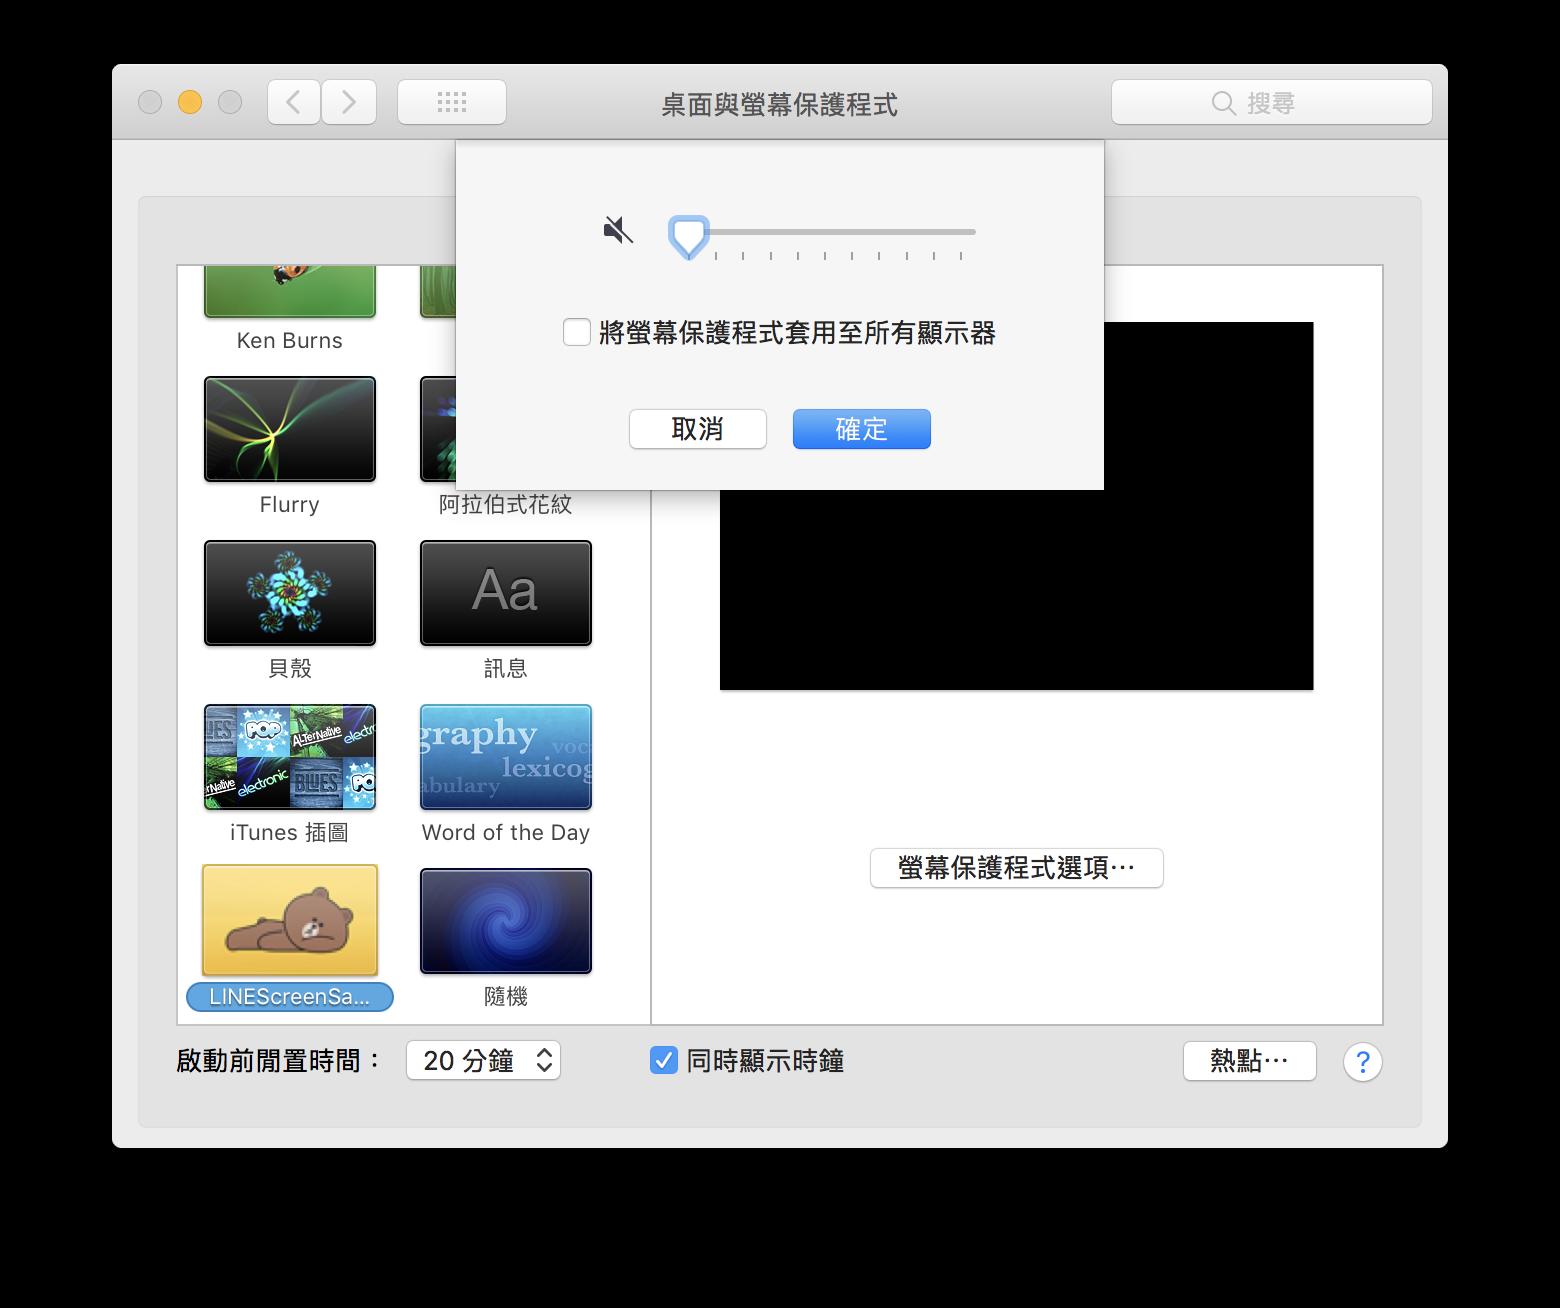 LINE 螢幕保護程式